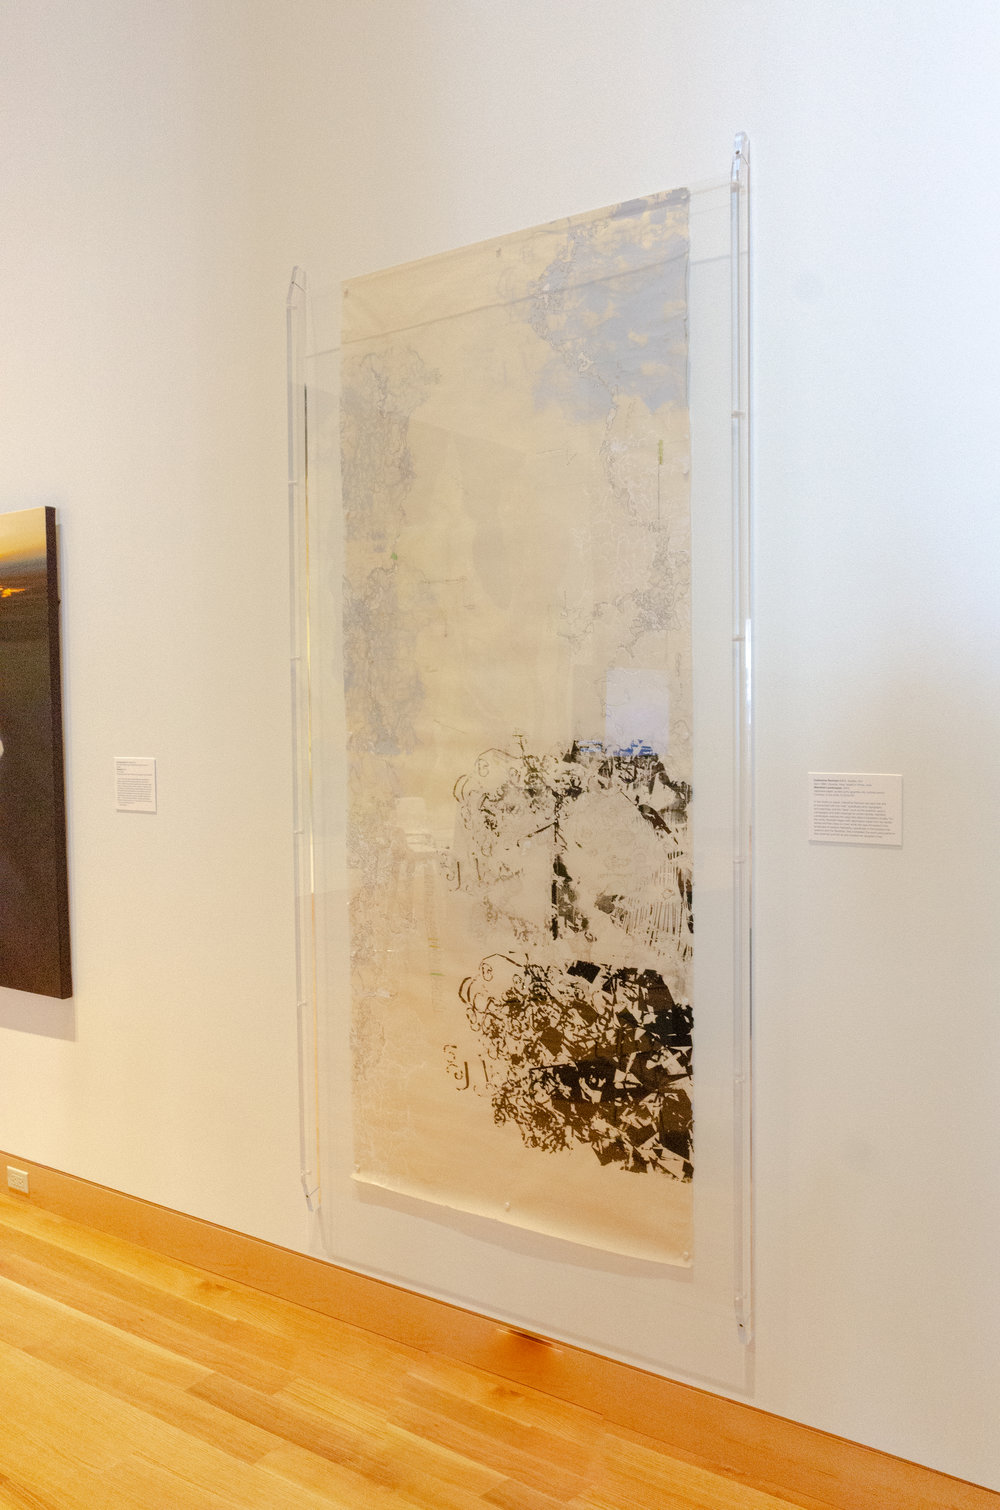 Manifold Landscapes under museum plexi. I have arrived!! :)